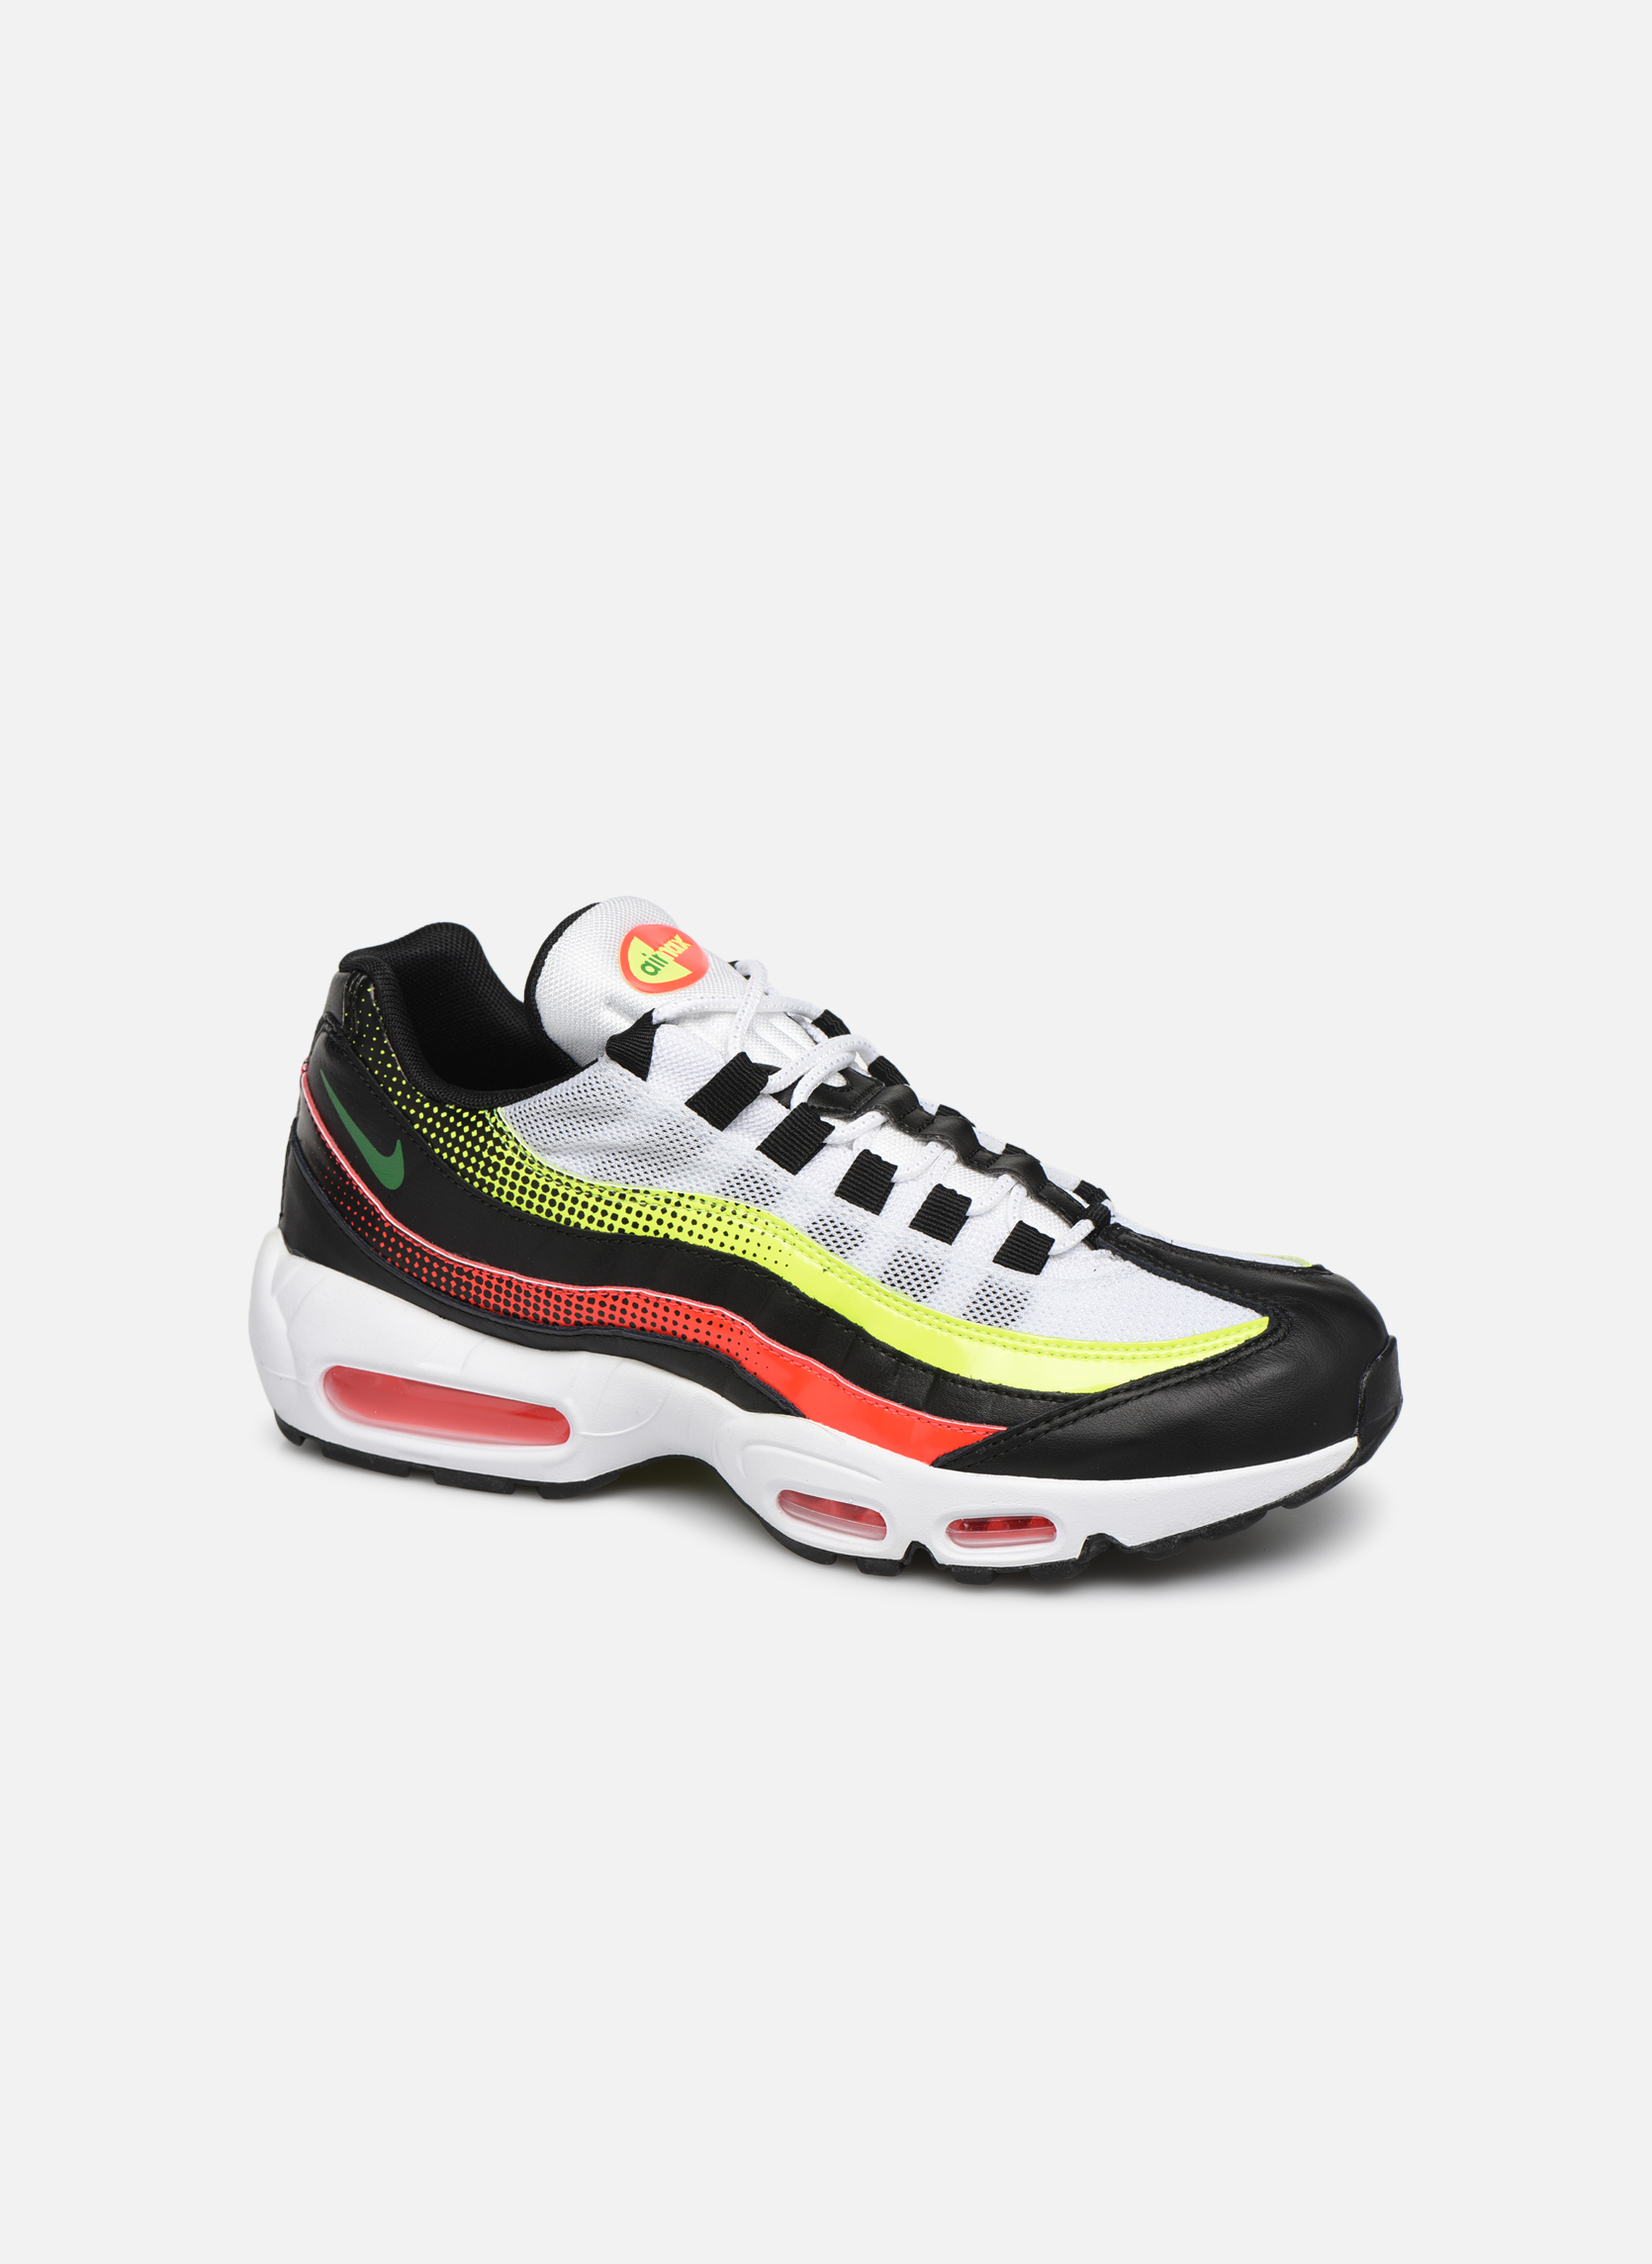 Sneakers Nike Air Max 95 Se by Nike